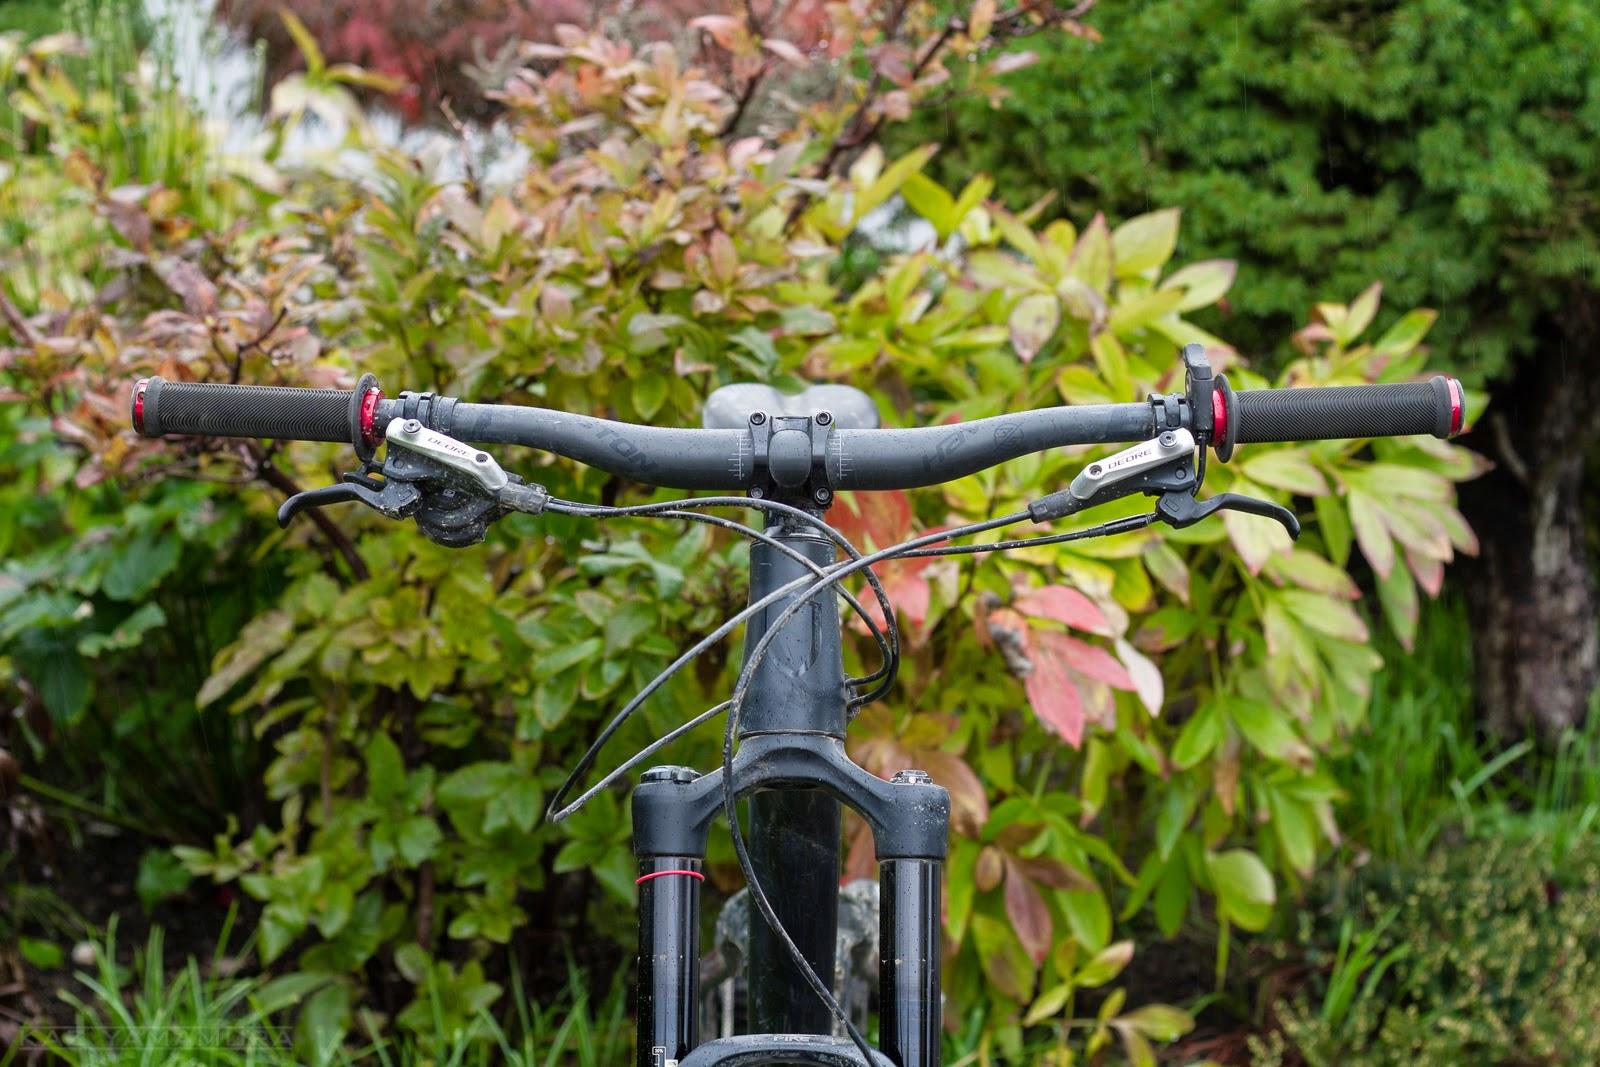 Bike News, New Product, Report, Carbon Mountain Bike, easton haven carbon bar, easton haven carbon stem, easton havoc carbon bar